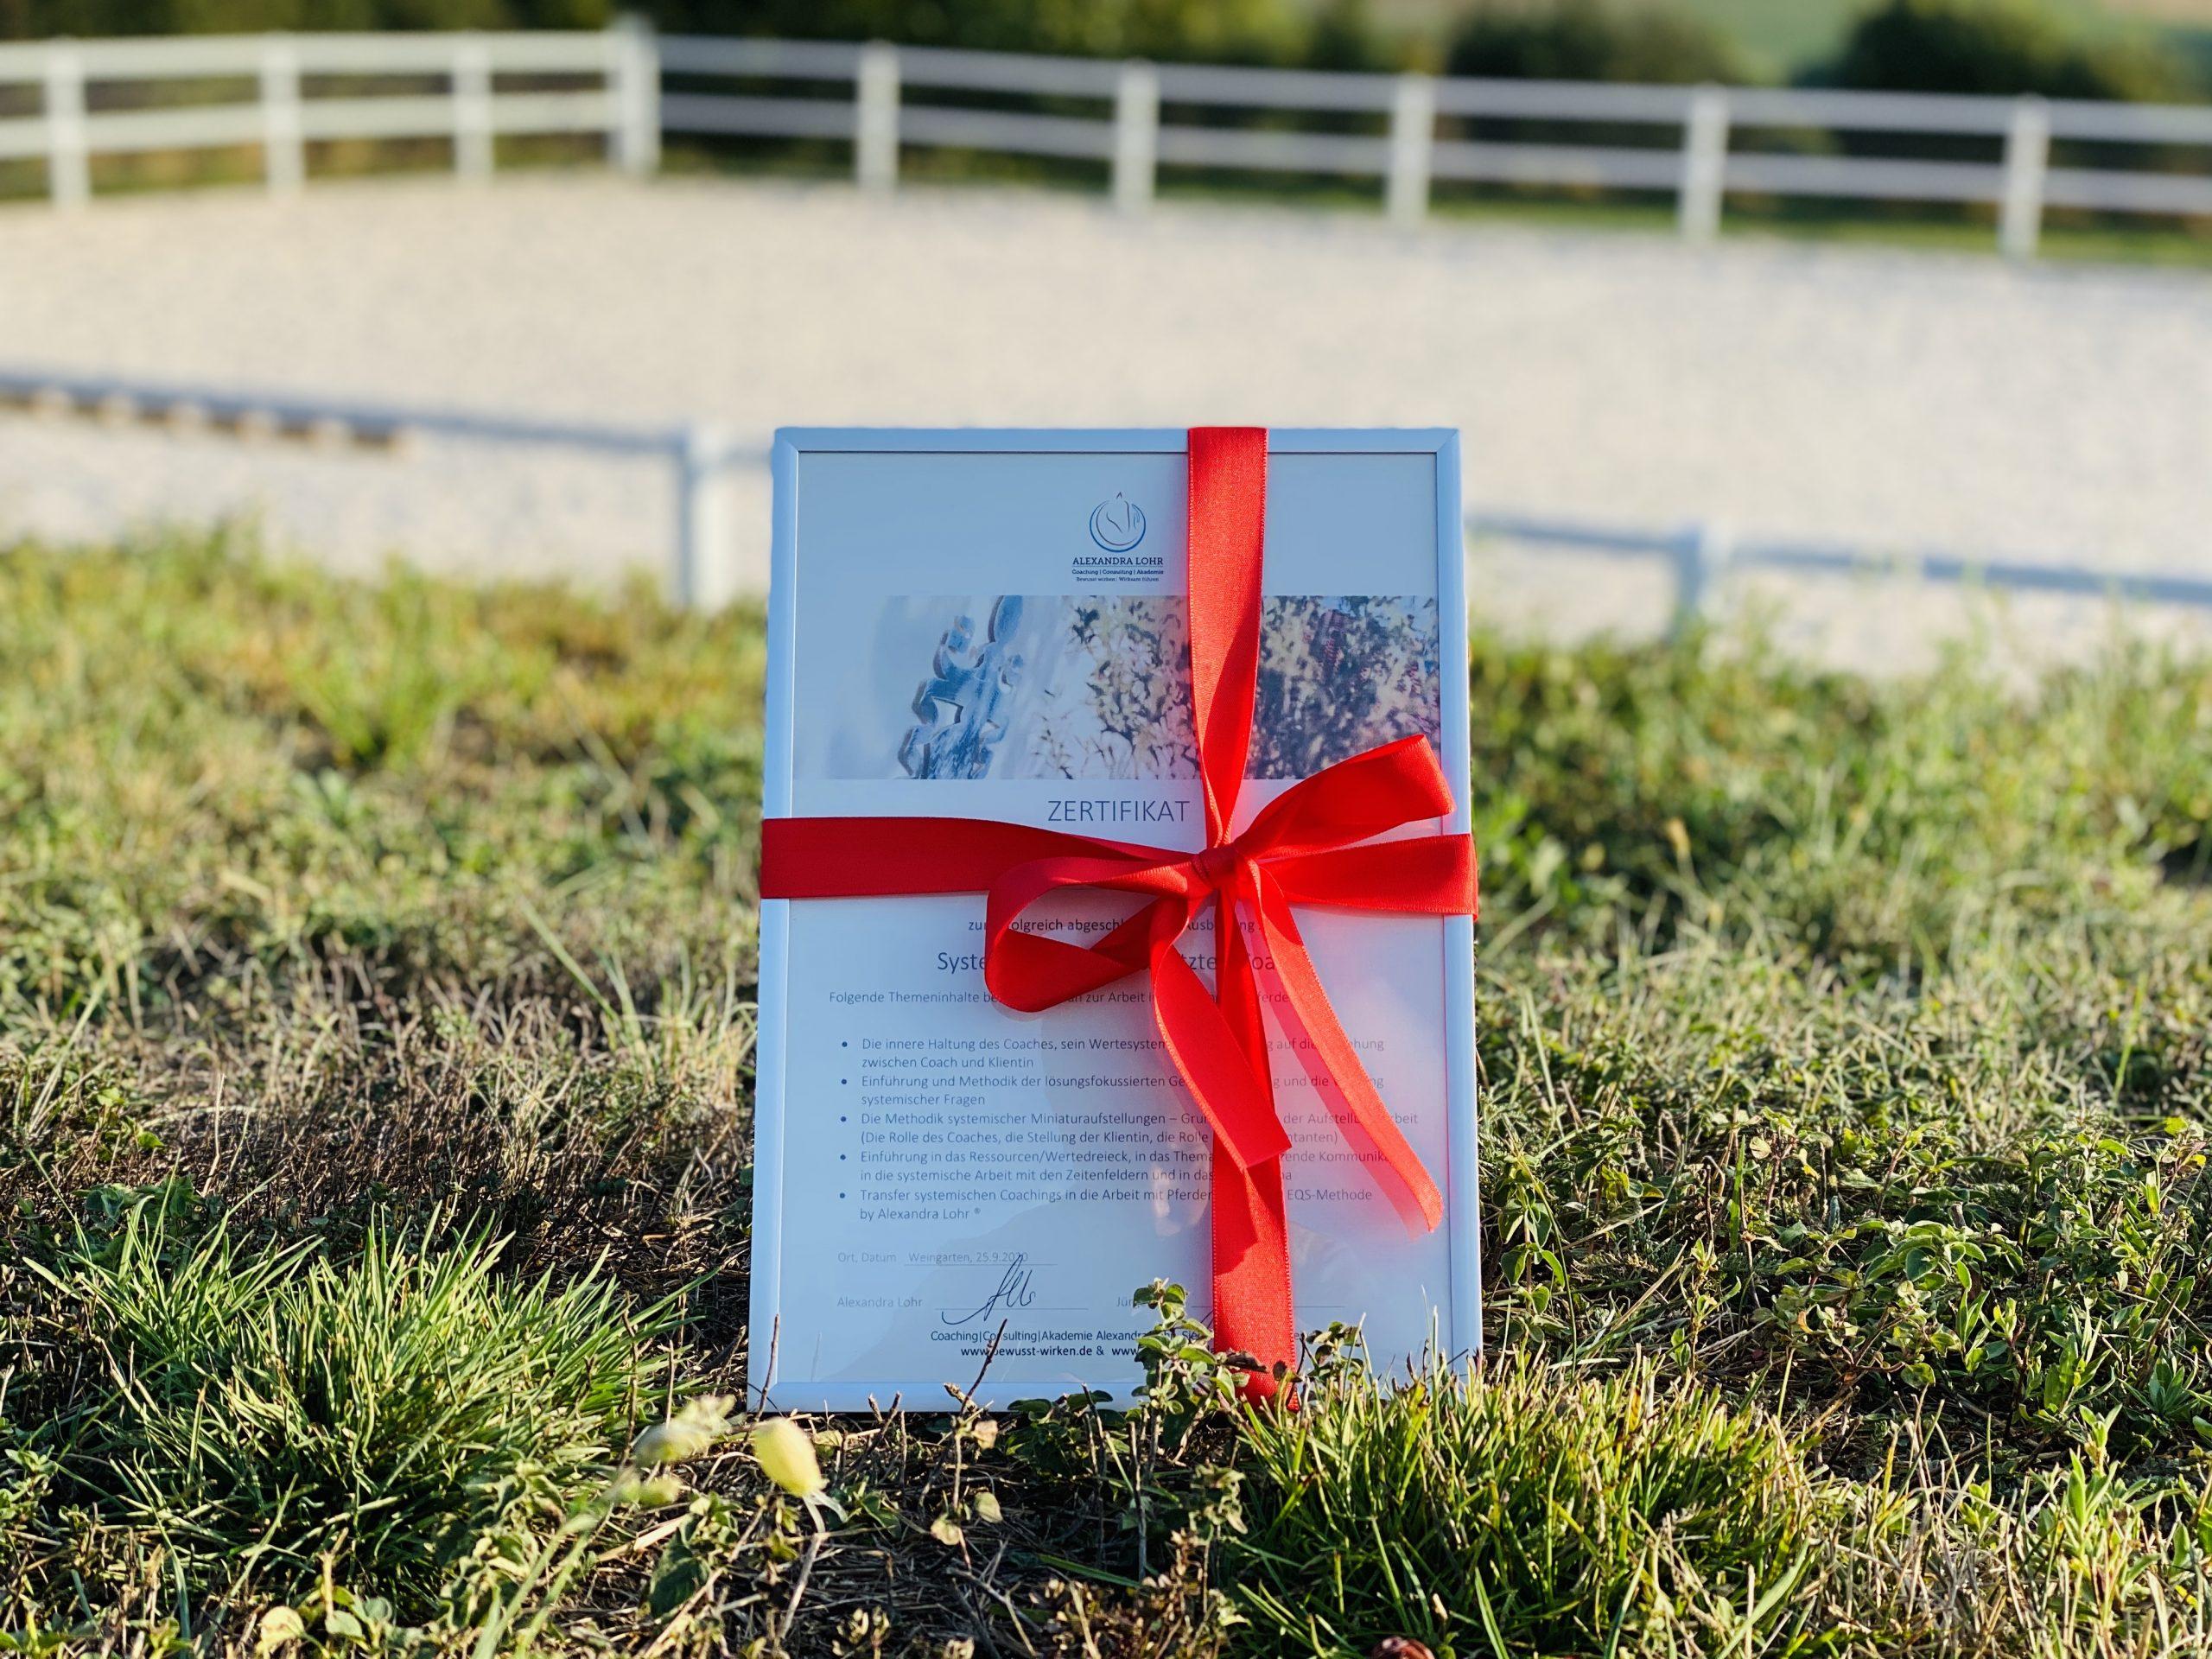 Zertifikat Pferdegestütztes Coaching